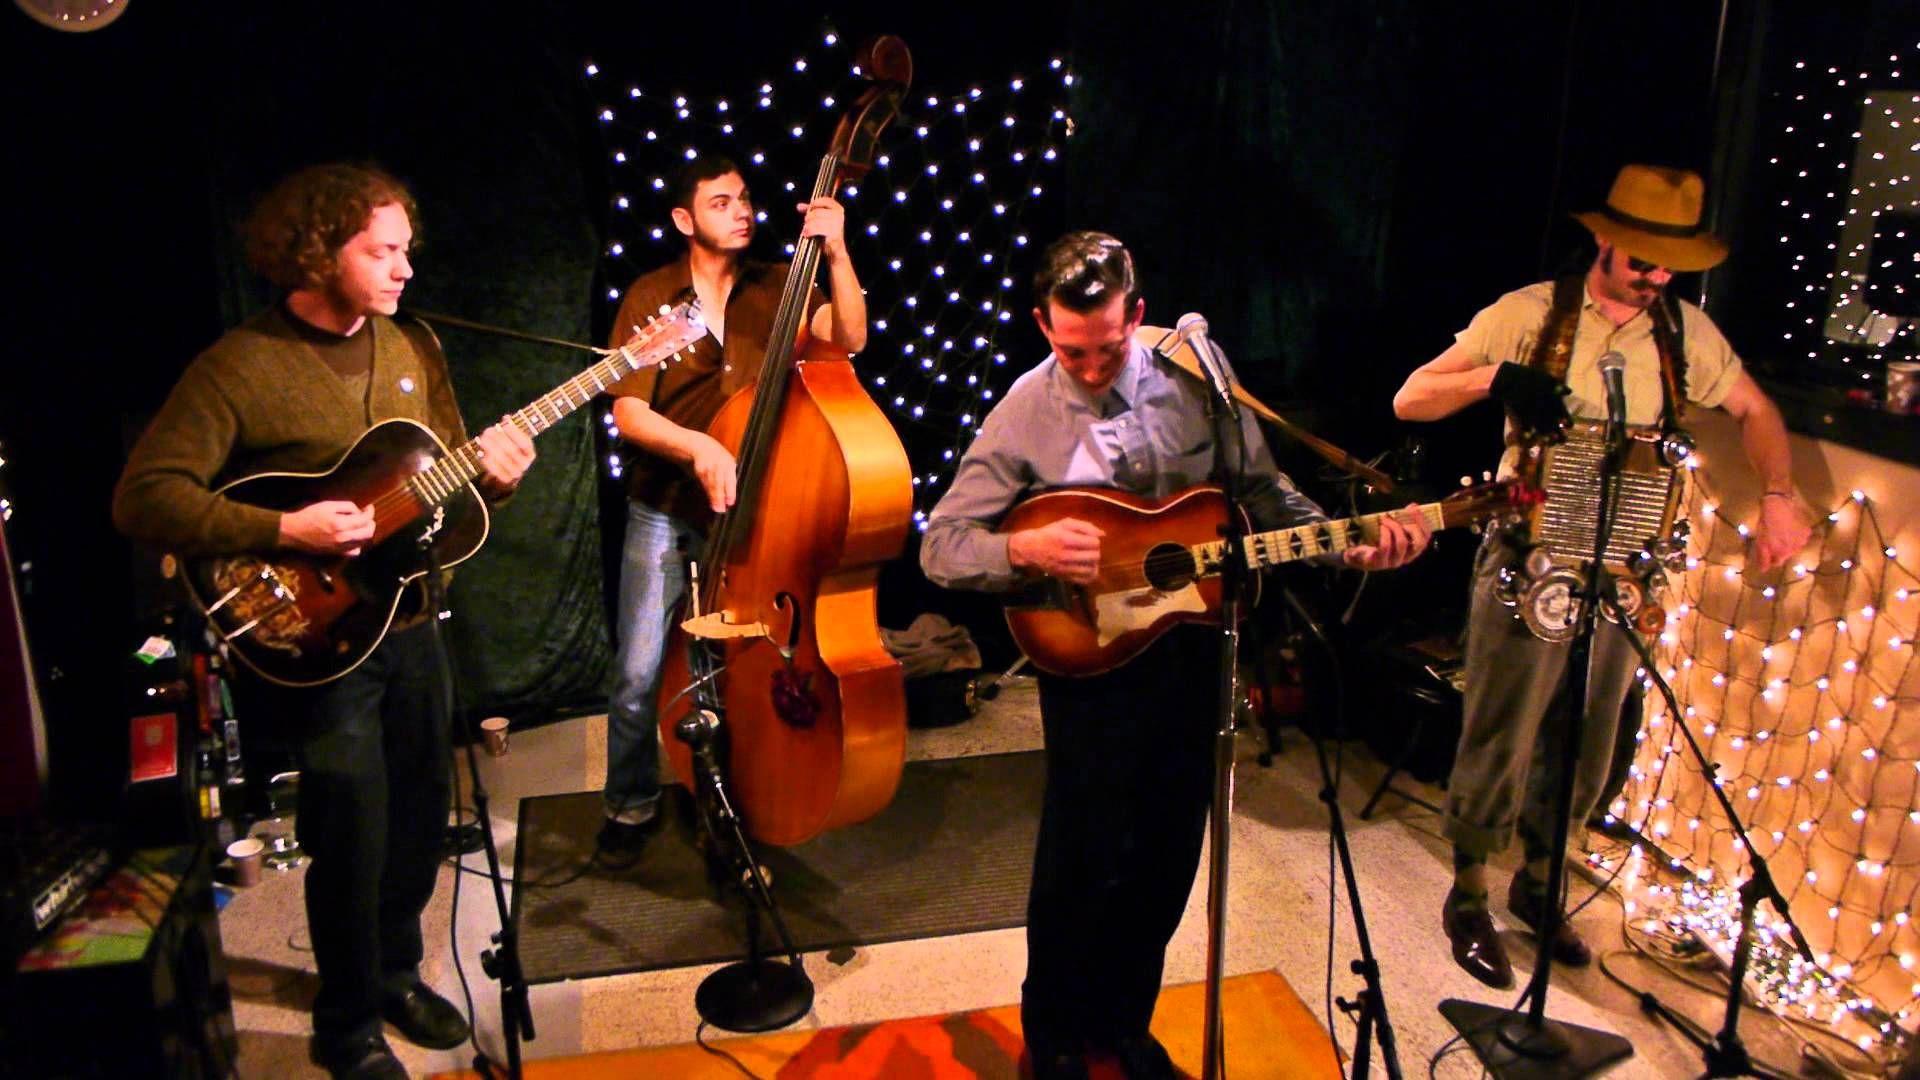 Pokey Lafarge The South City Three Full Performance Live On Kexp Video Film Performance Las Vegas Concerts